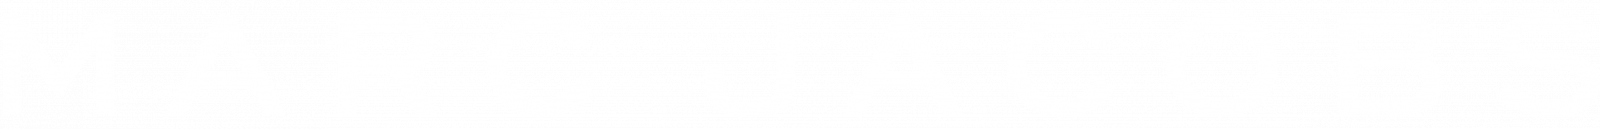 marc-jacobs